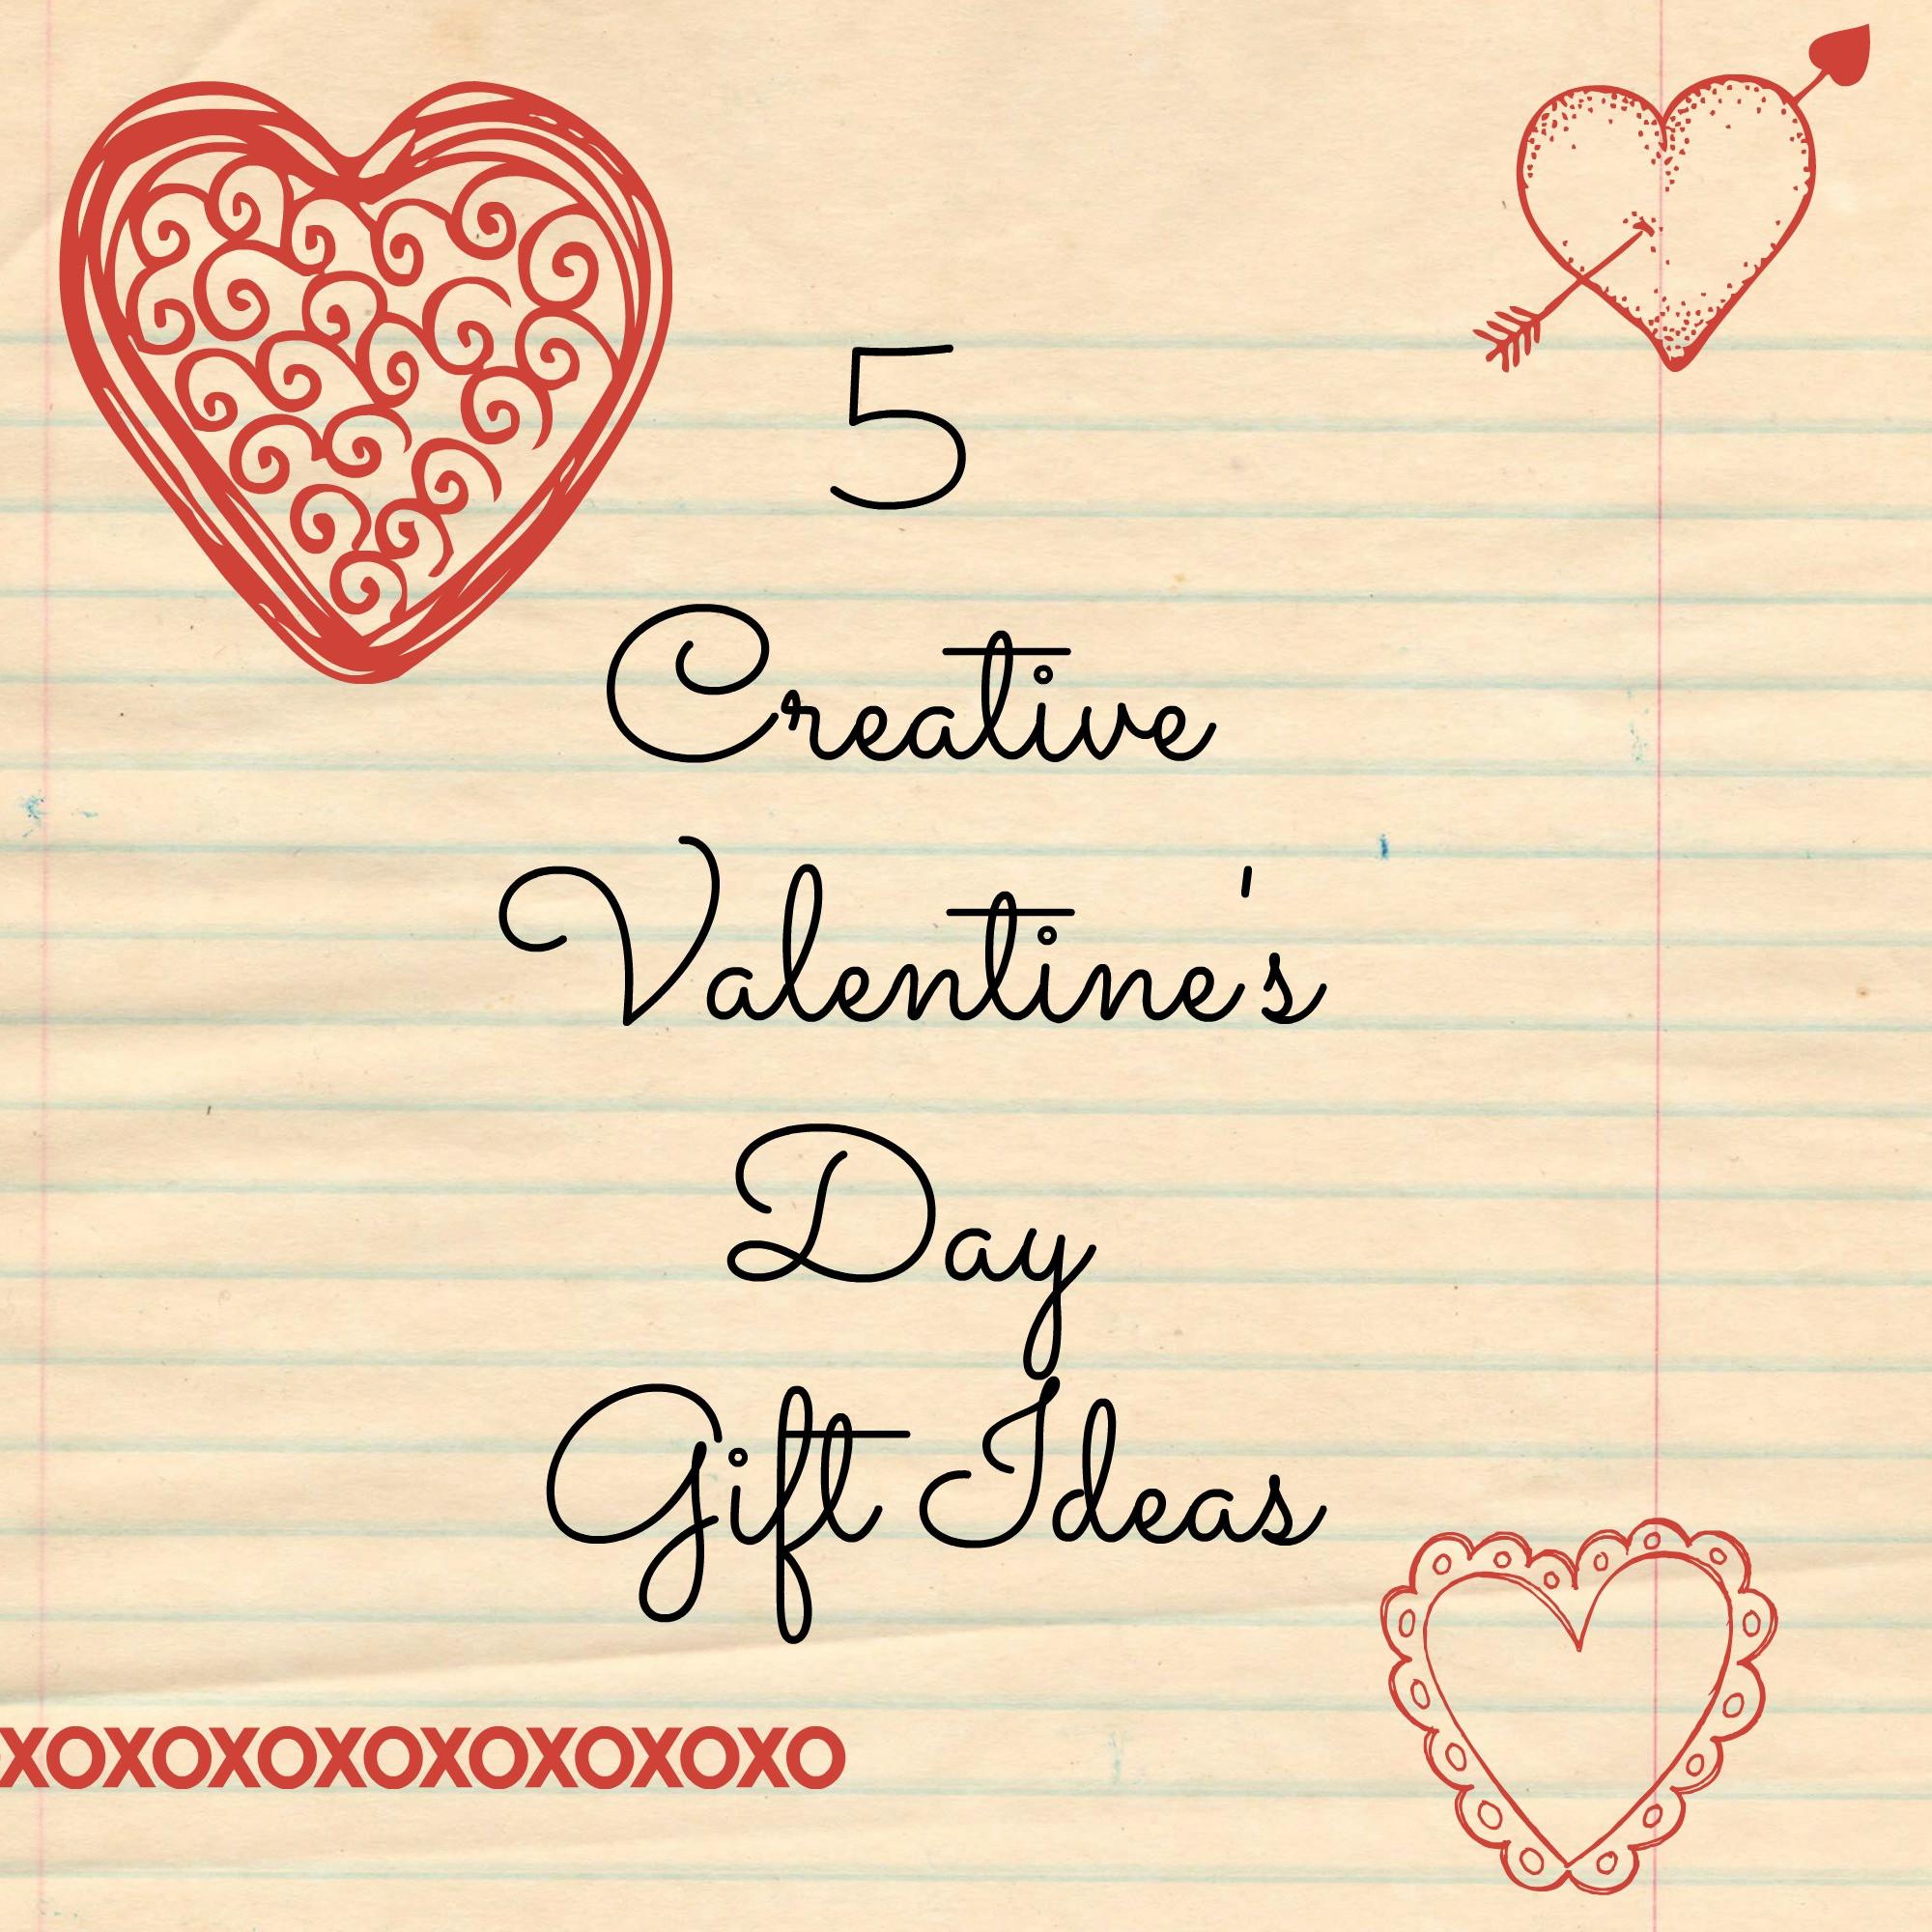 Valentine'S Day Gift Card Ideas  5 Creative Valentine's Day Gift Ideas